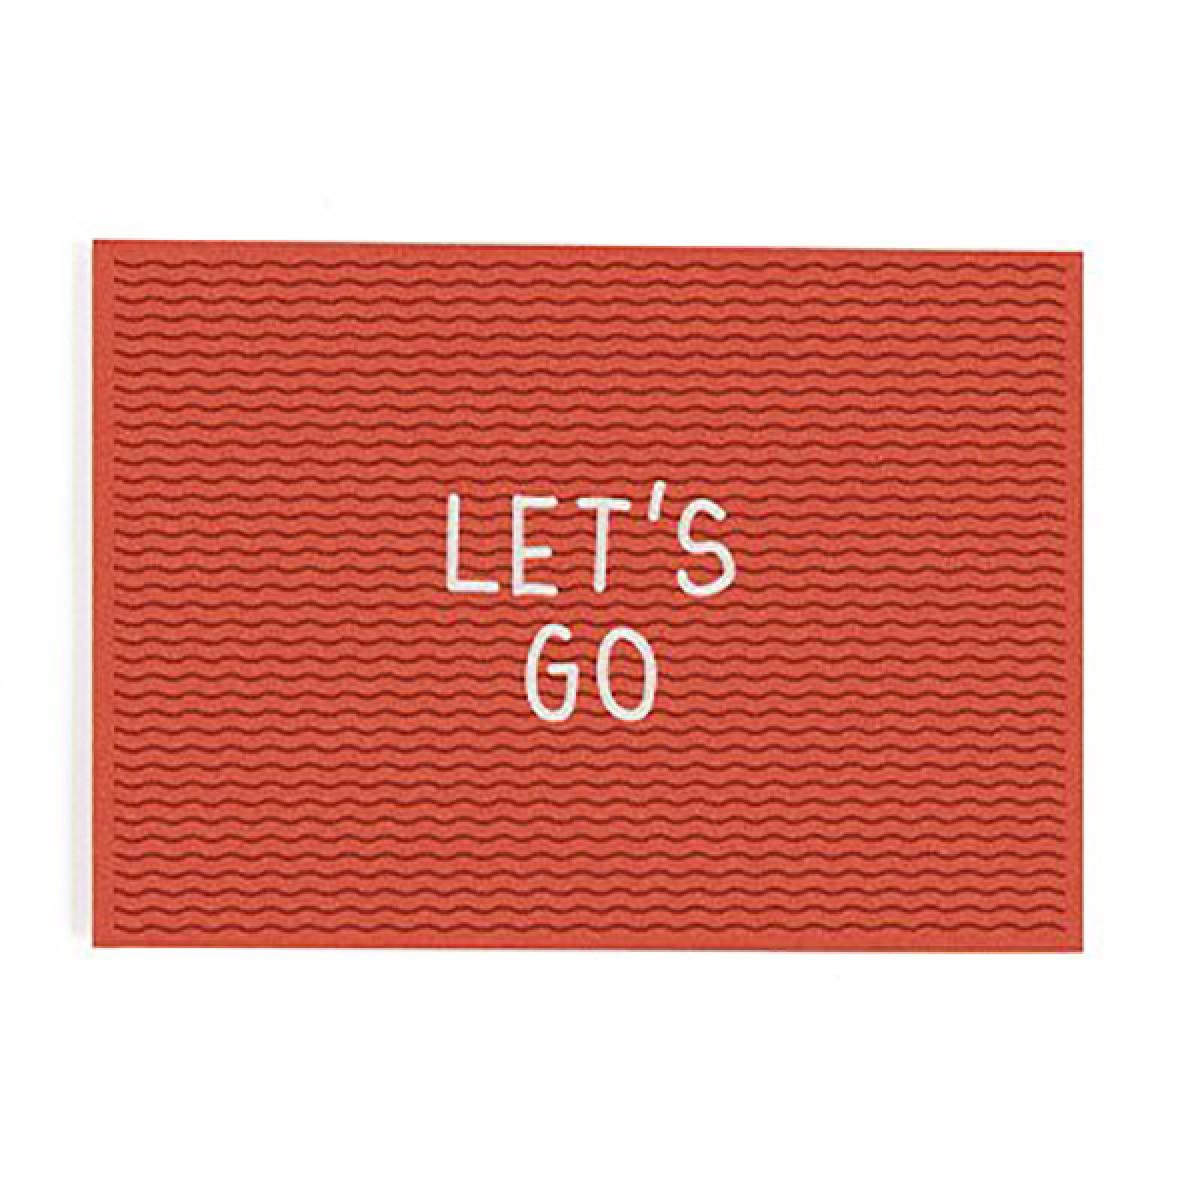 """Let's go"" Postkarte von Roadtyping"